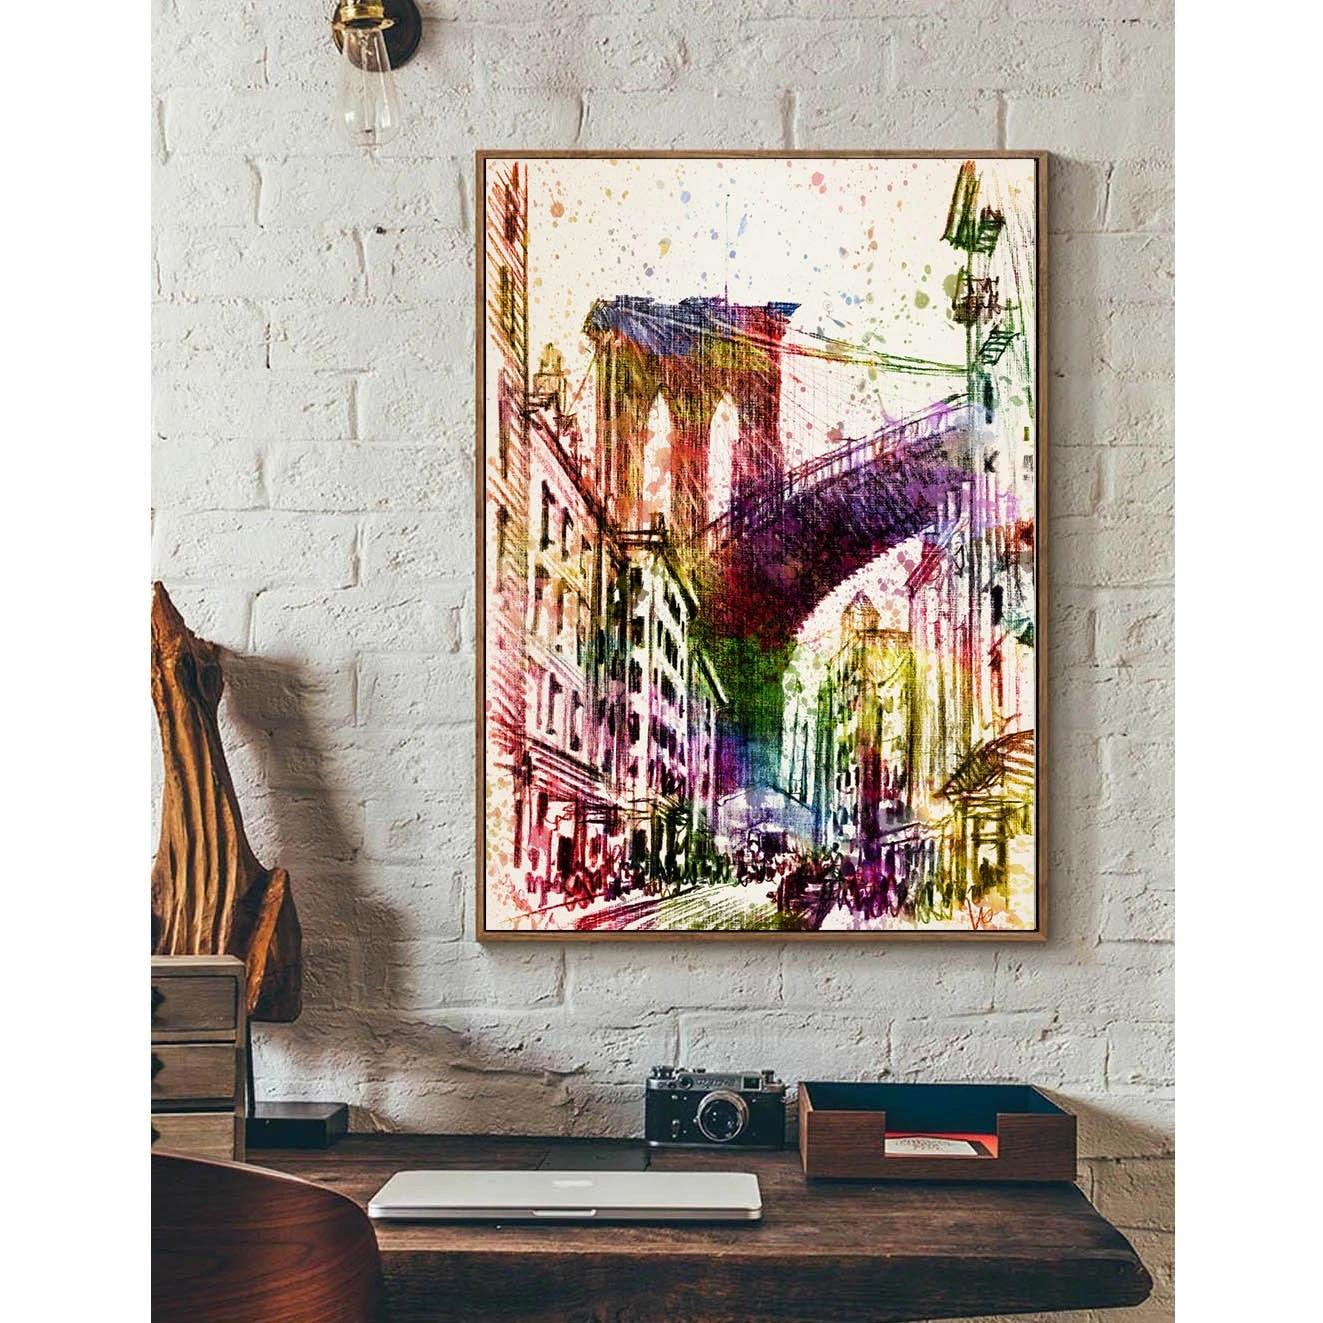 New York Brooklyn Bridge Minimalismus Kunst Leinwand Plakat Druck Stadtbild Bild Fur Moderne Home Office Wanddekor Geschenk Fa106 Brooklyn Bridge Art Canvasposter Print Aliexpress